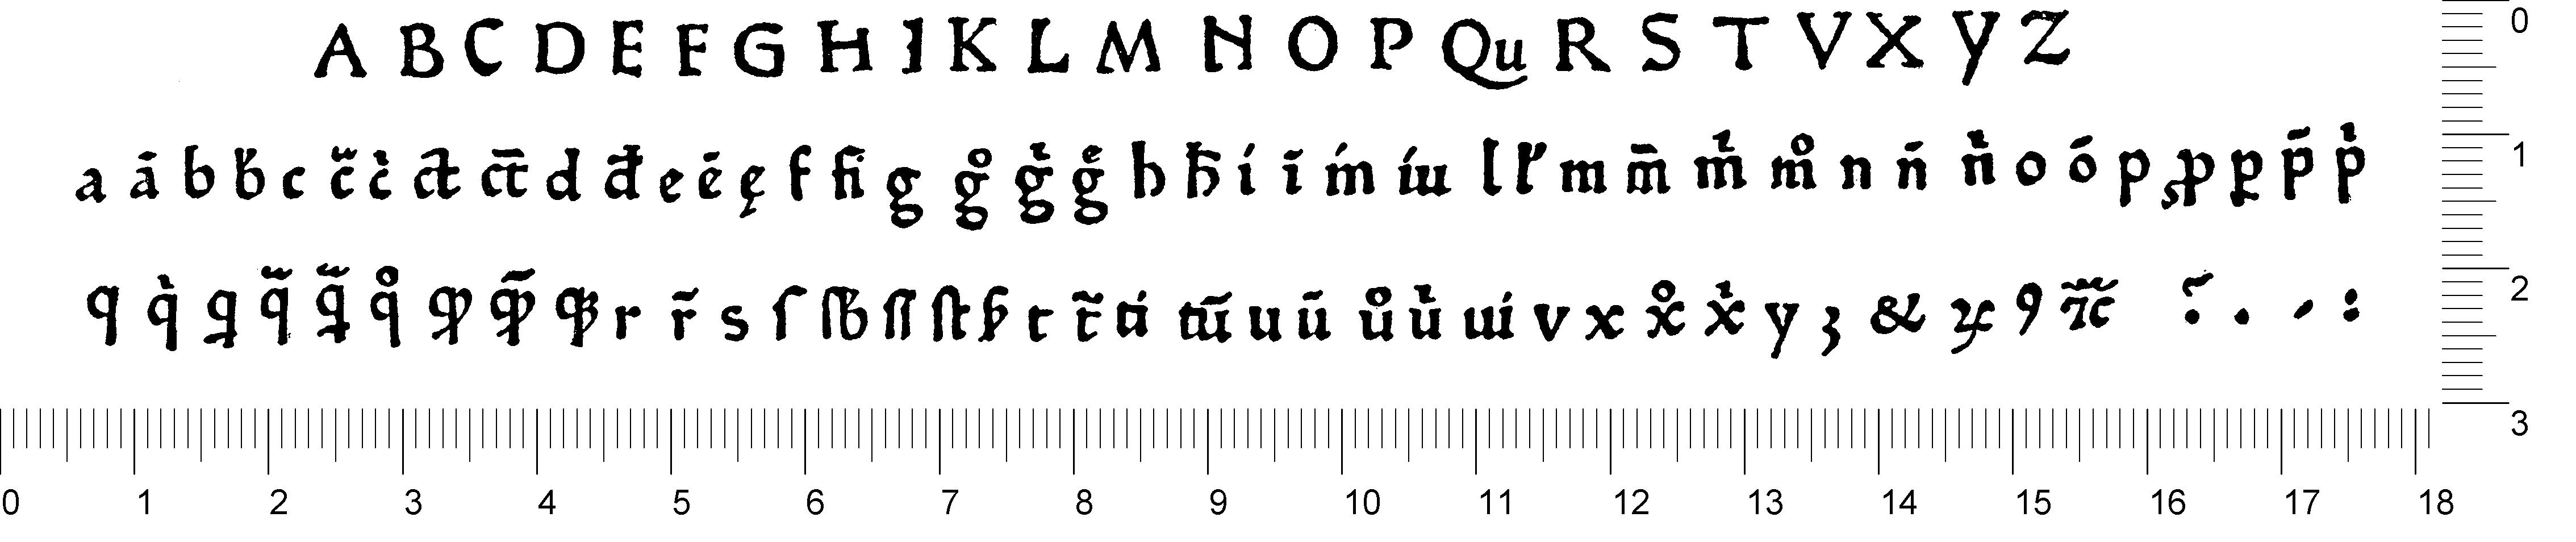 GfT0549.1